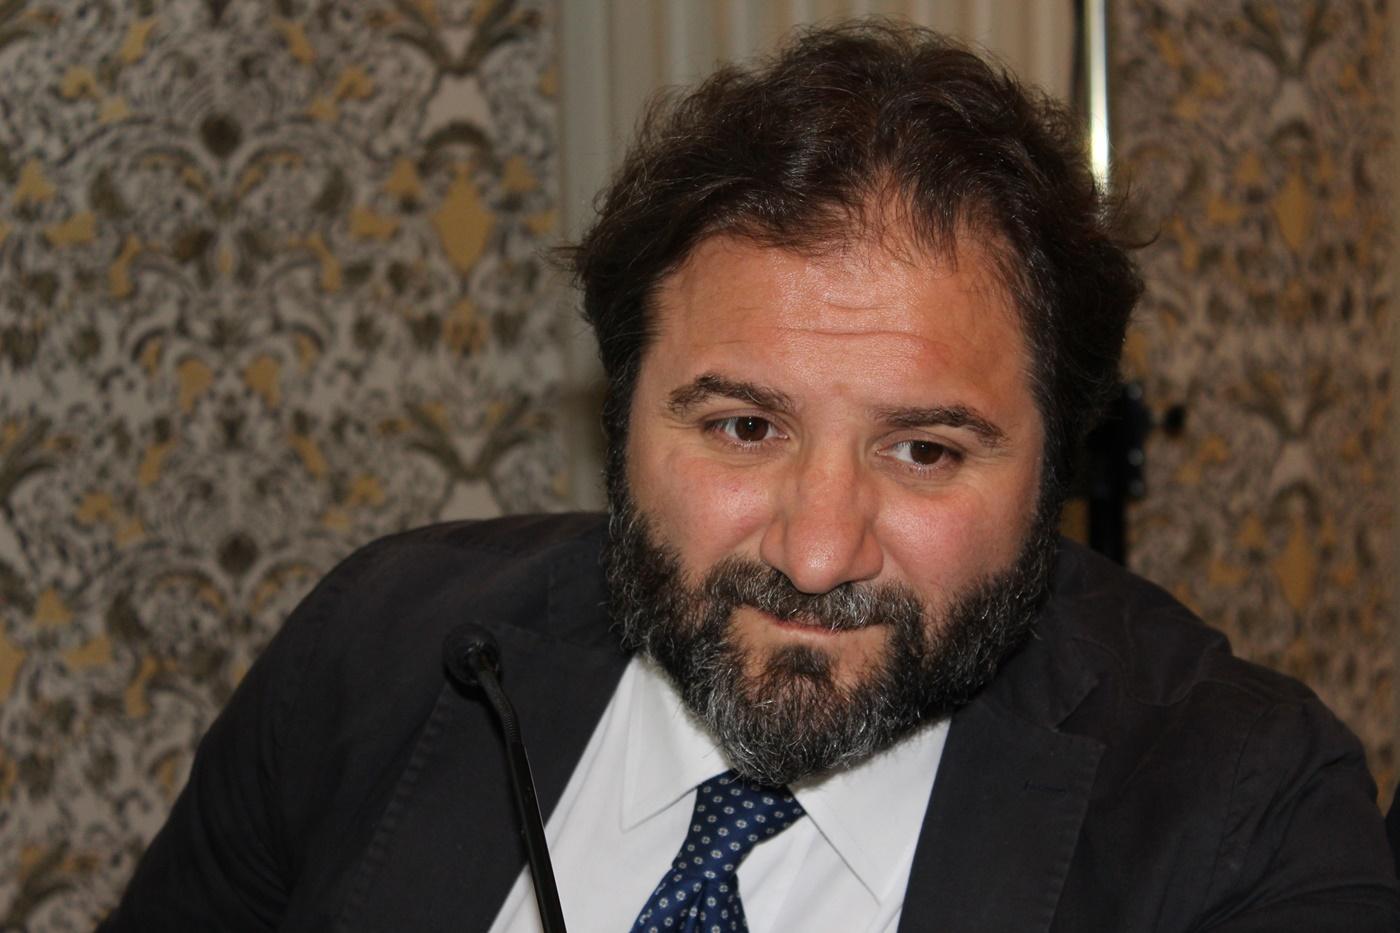 Ivano Gabrielli